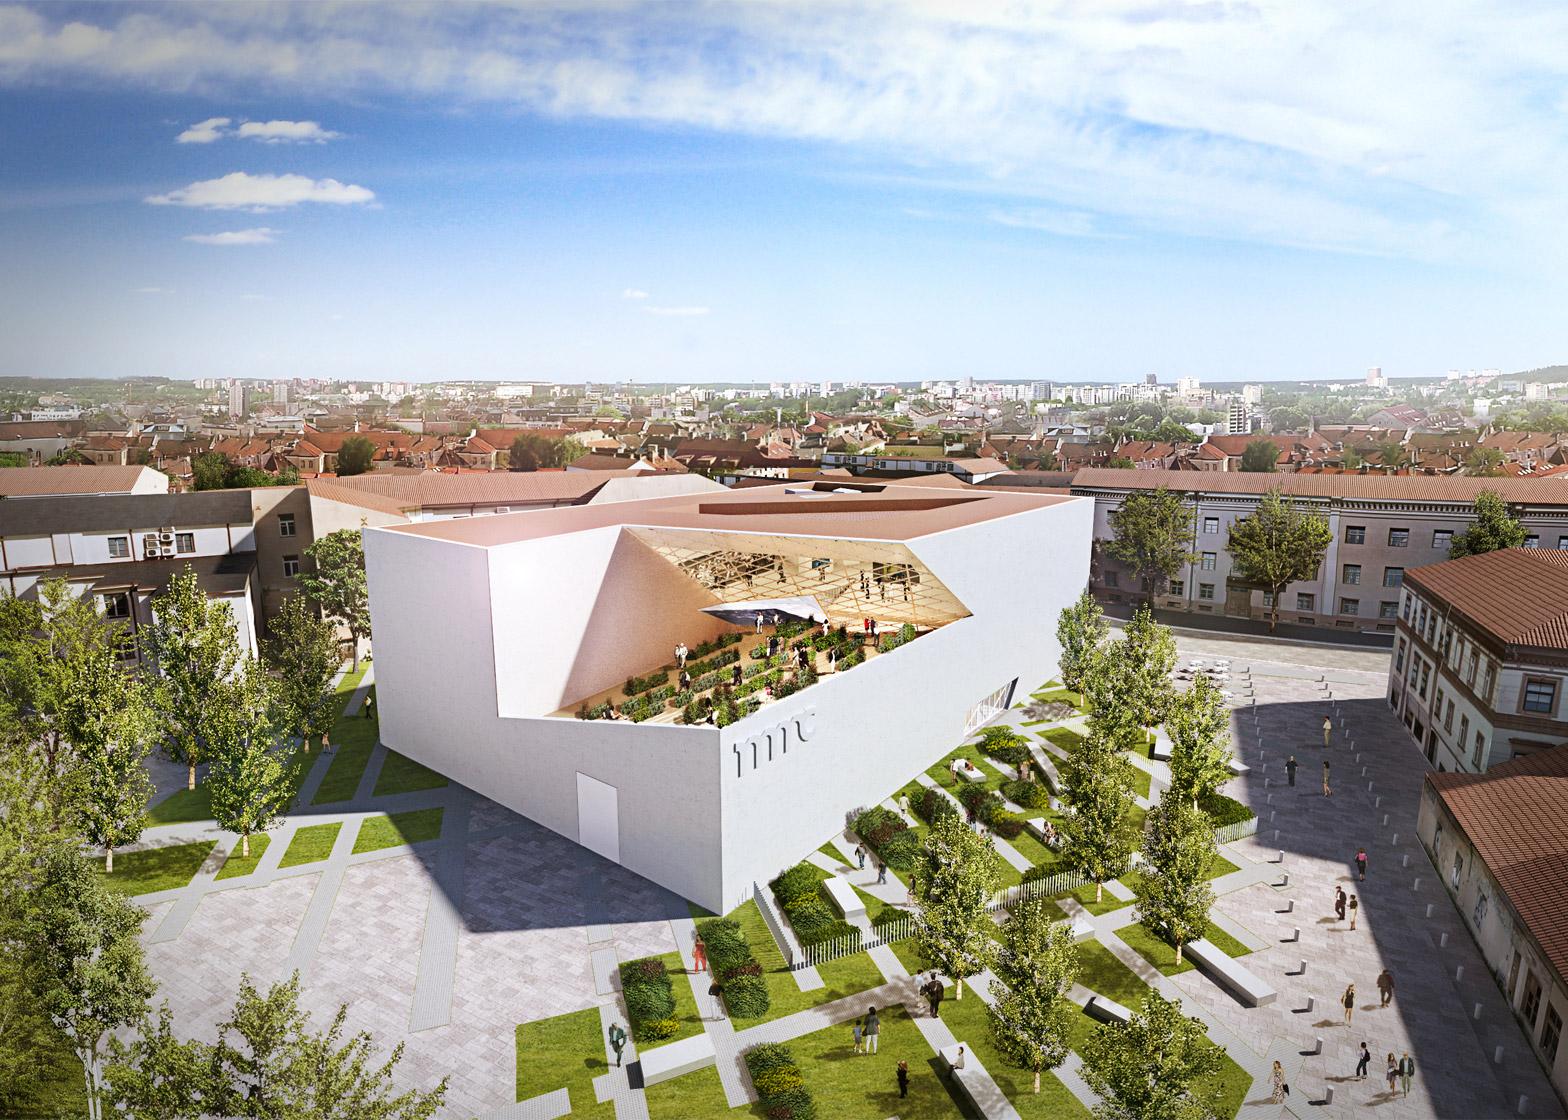 Modern Art Center Vilnius by Studio Libeskind